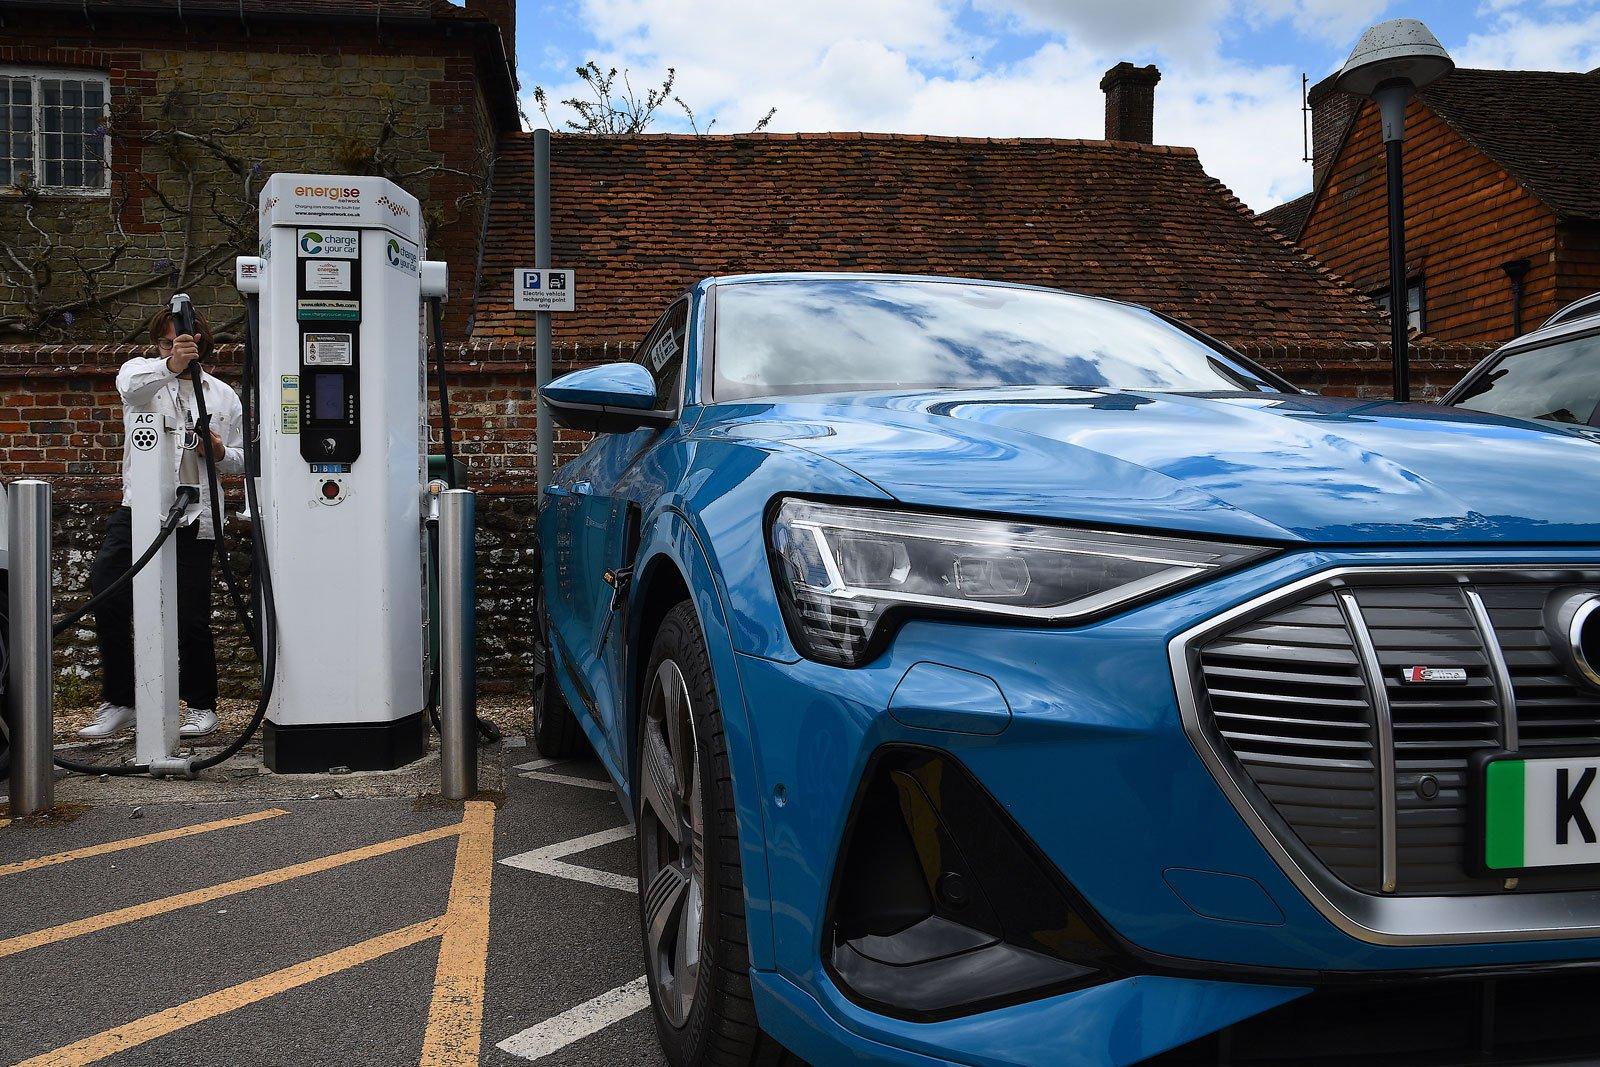 Public charging electric car